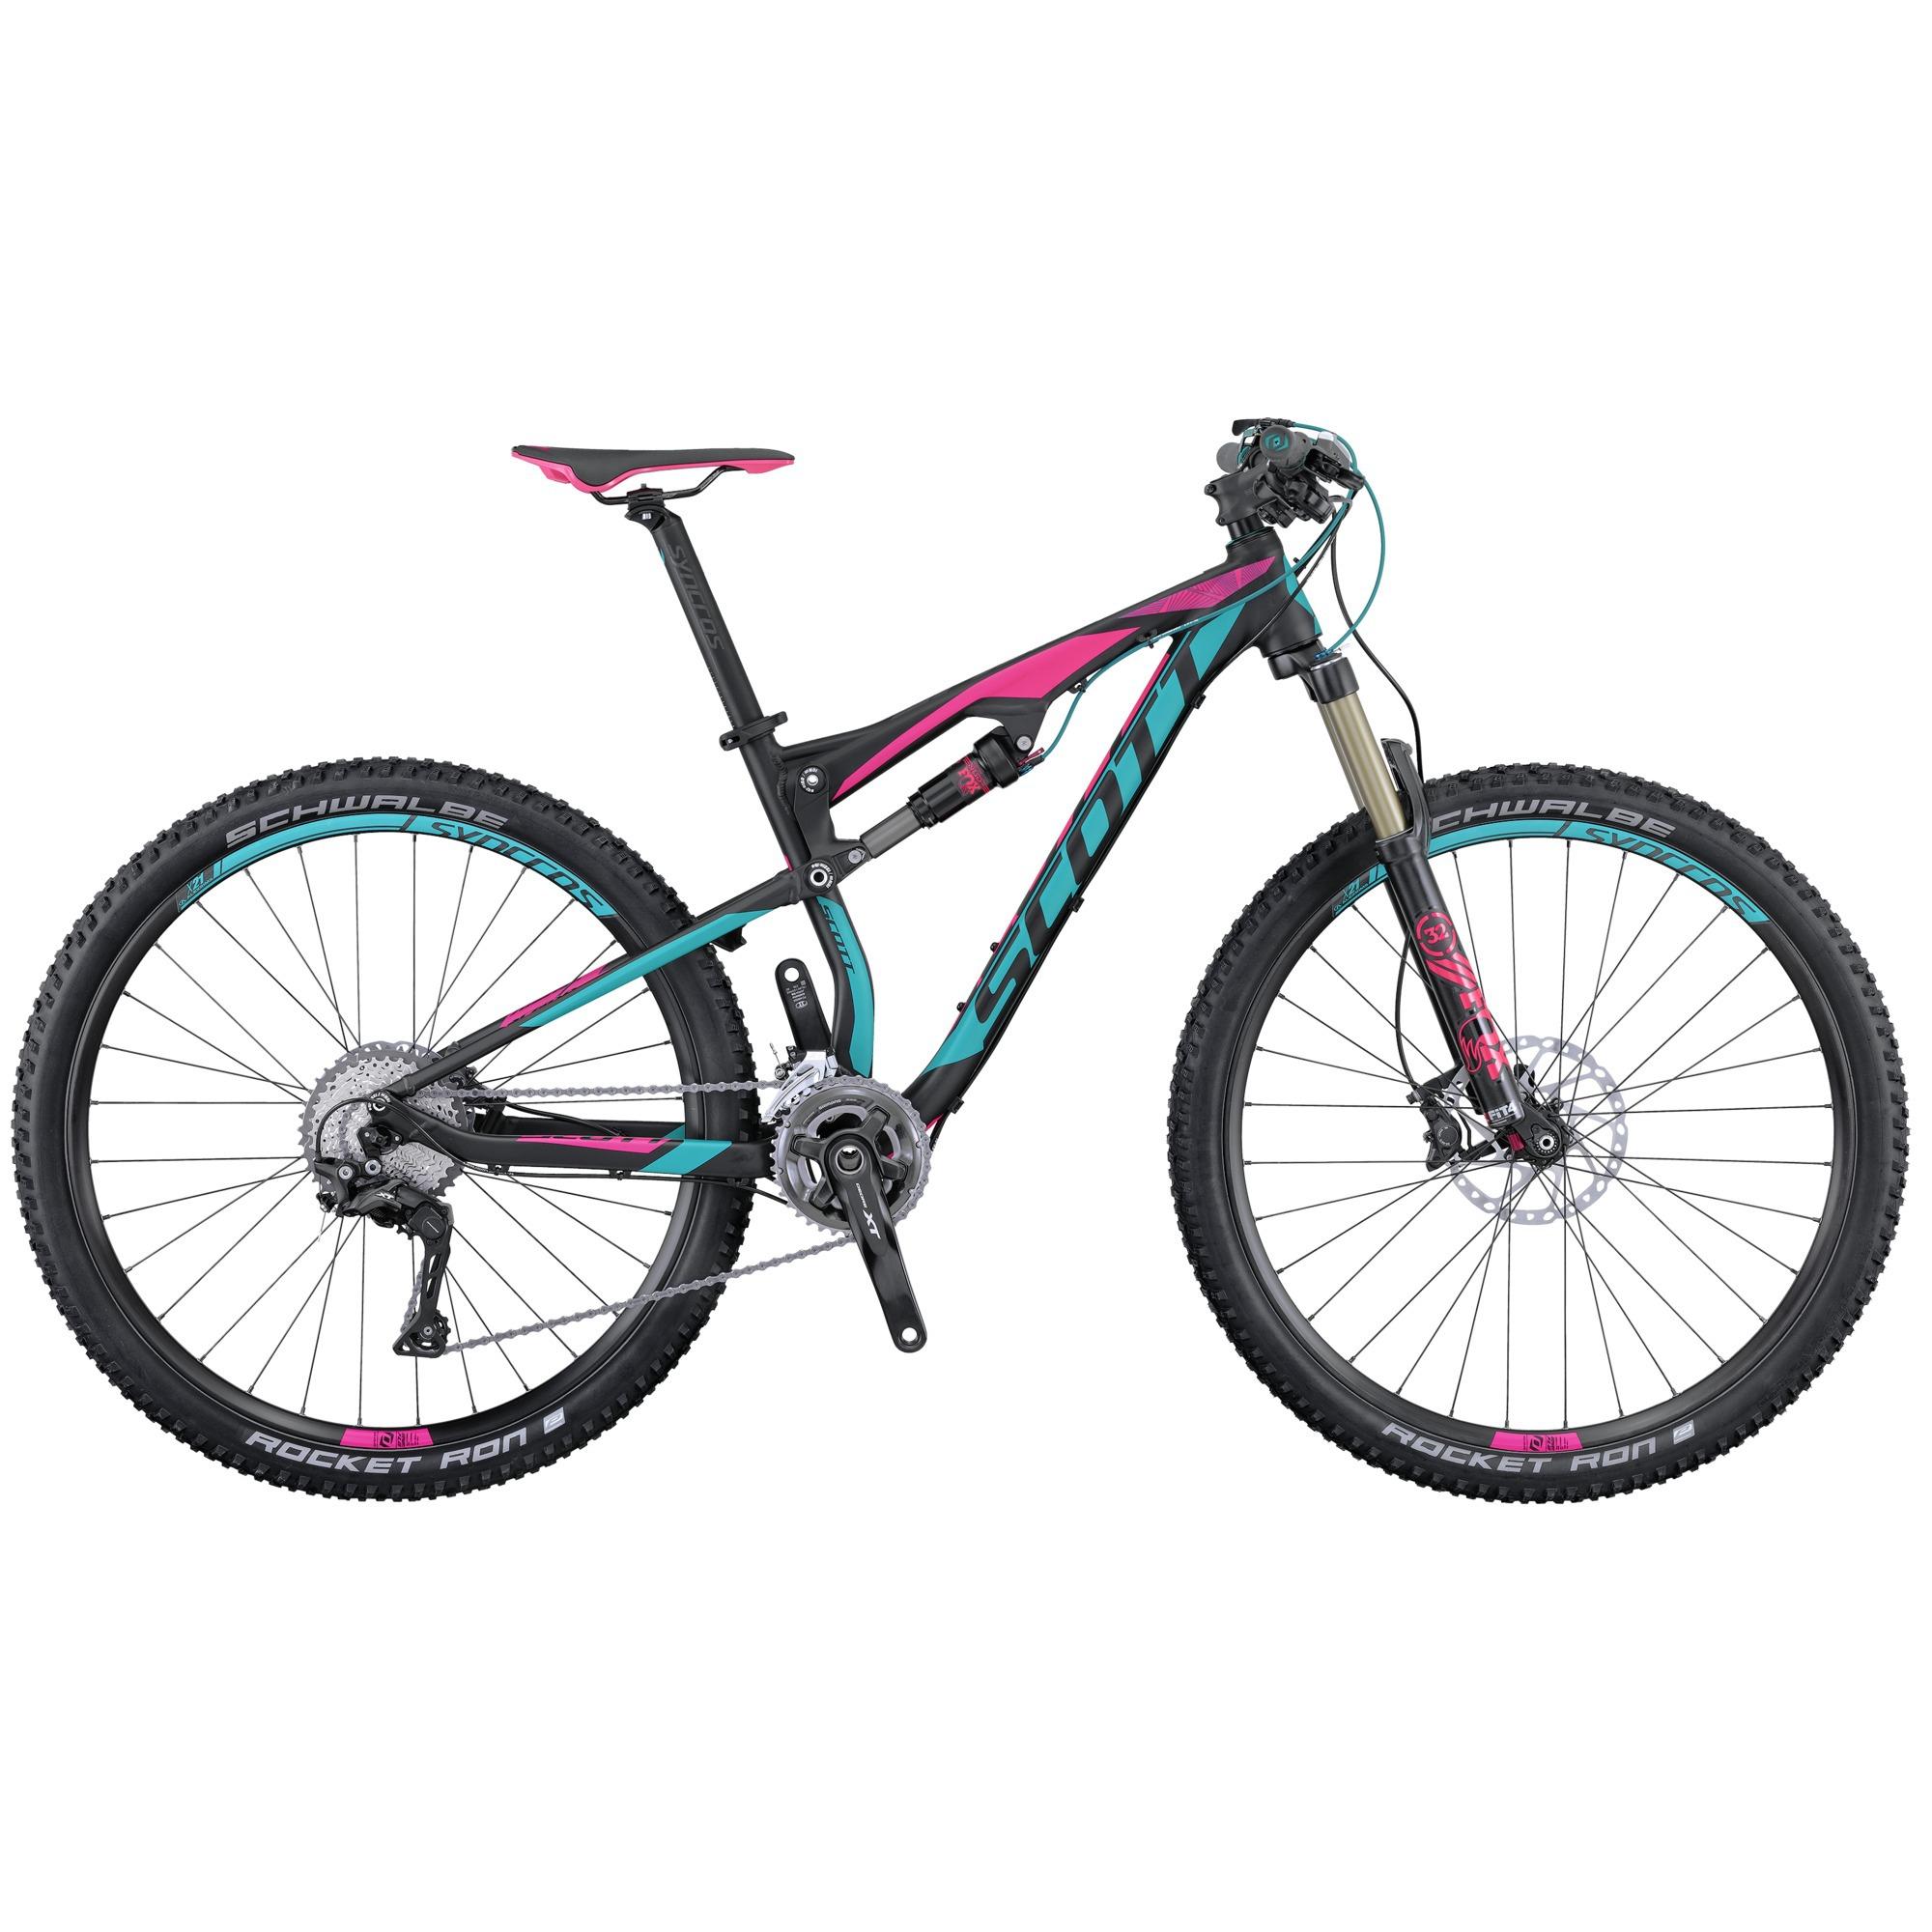 Scott Contessa Spark 700 (2016)  велосипед scott contessa spark 700 2016